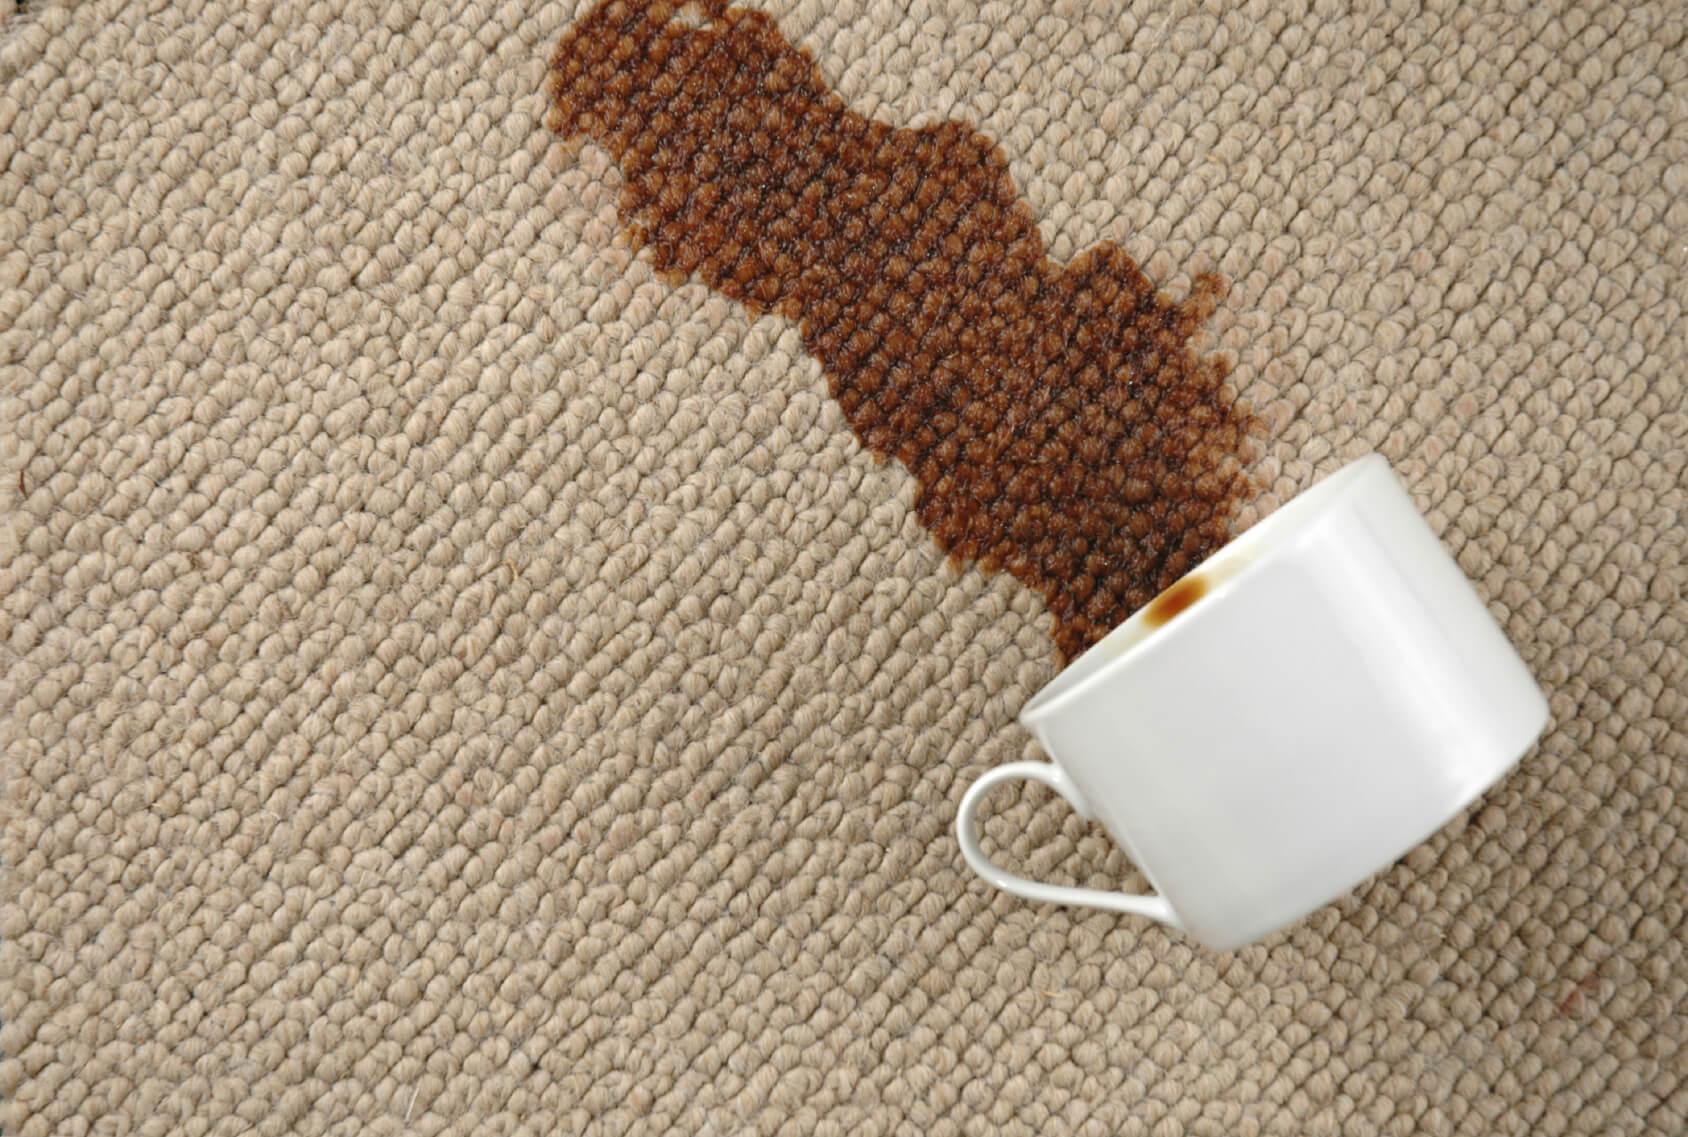 очистка дивана от кофе